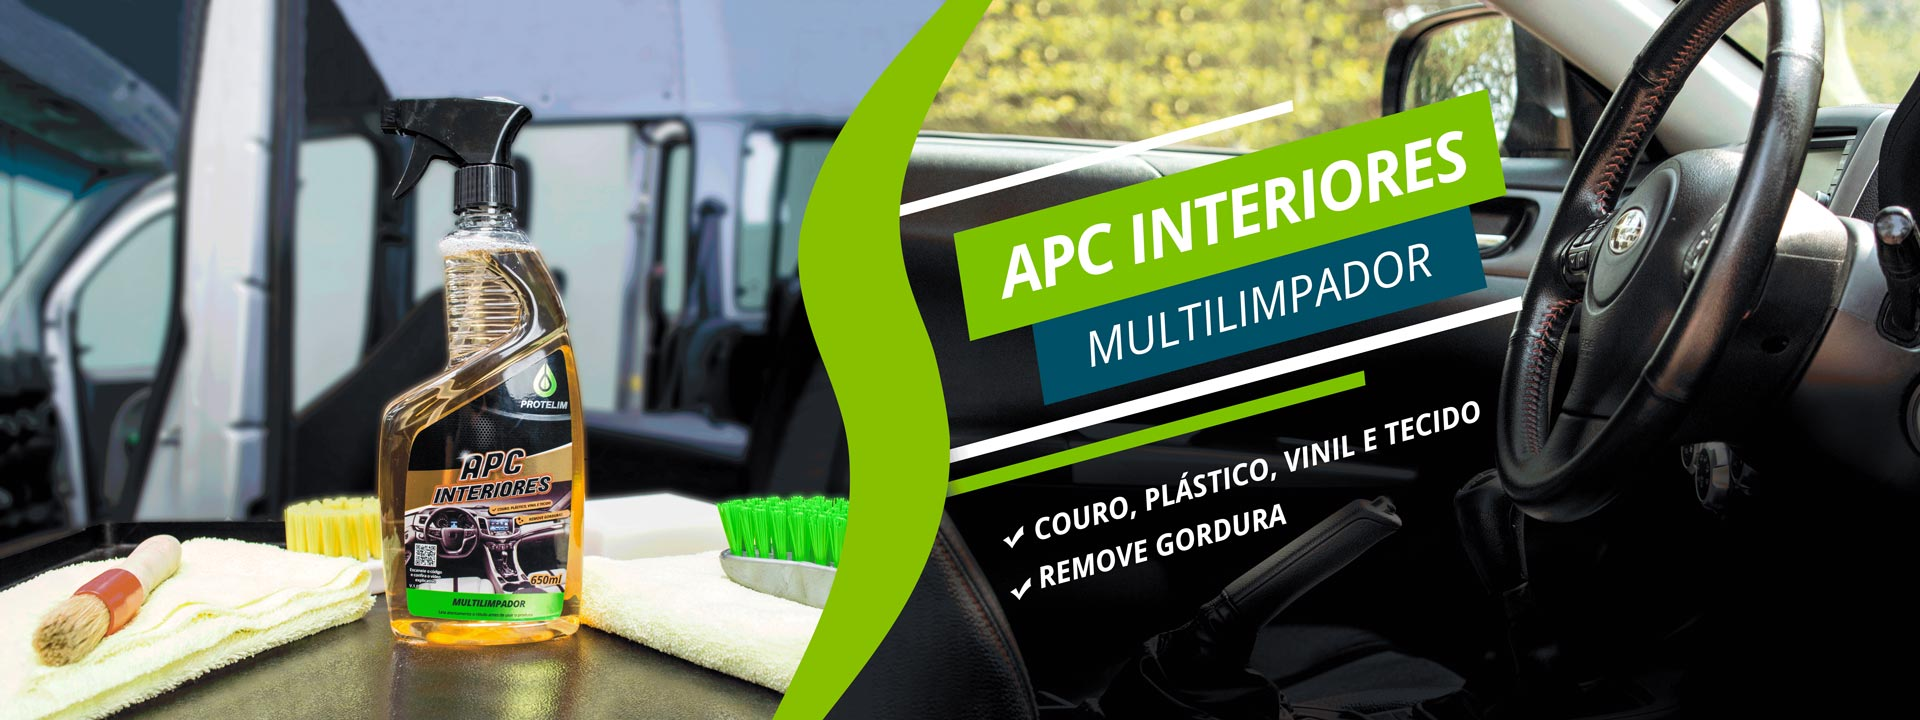 Banner-APC-INTERIORES-WEB1